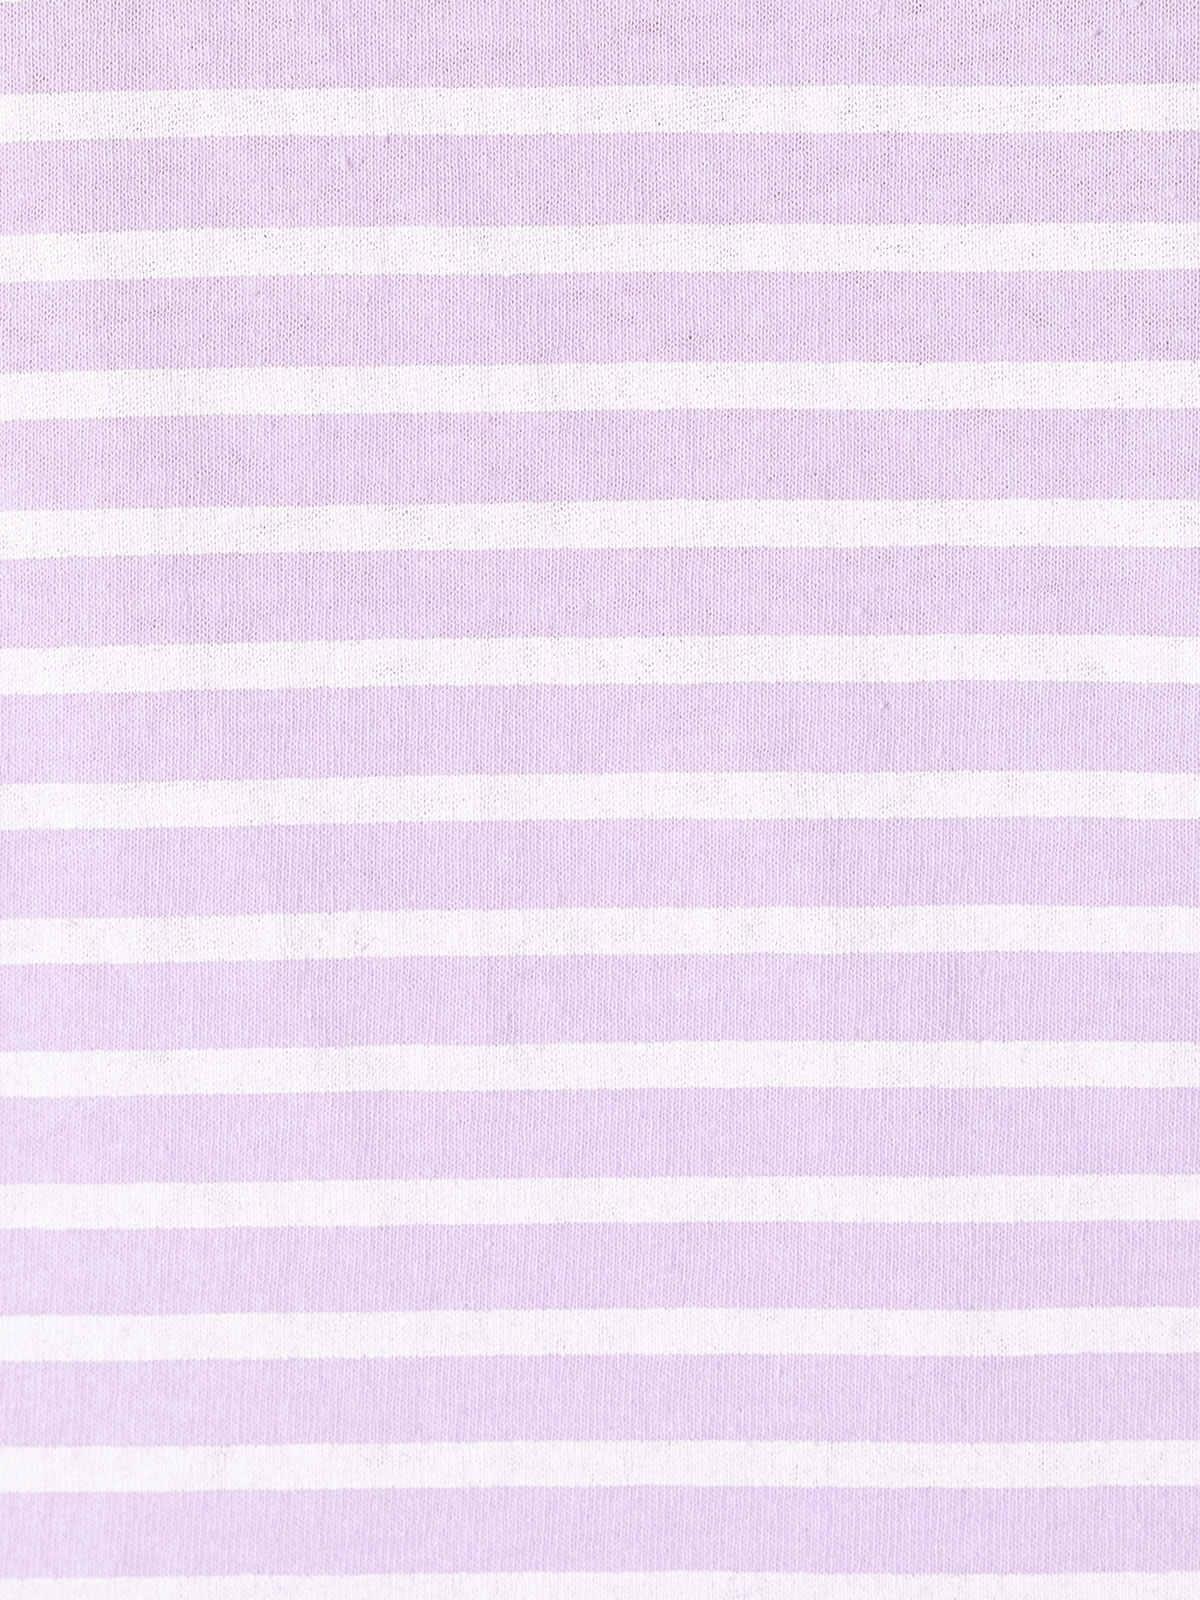 Camiseta mujer rayas algodón Lila